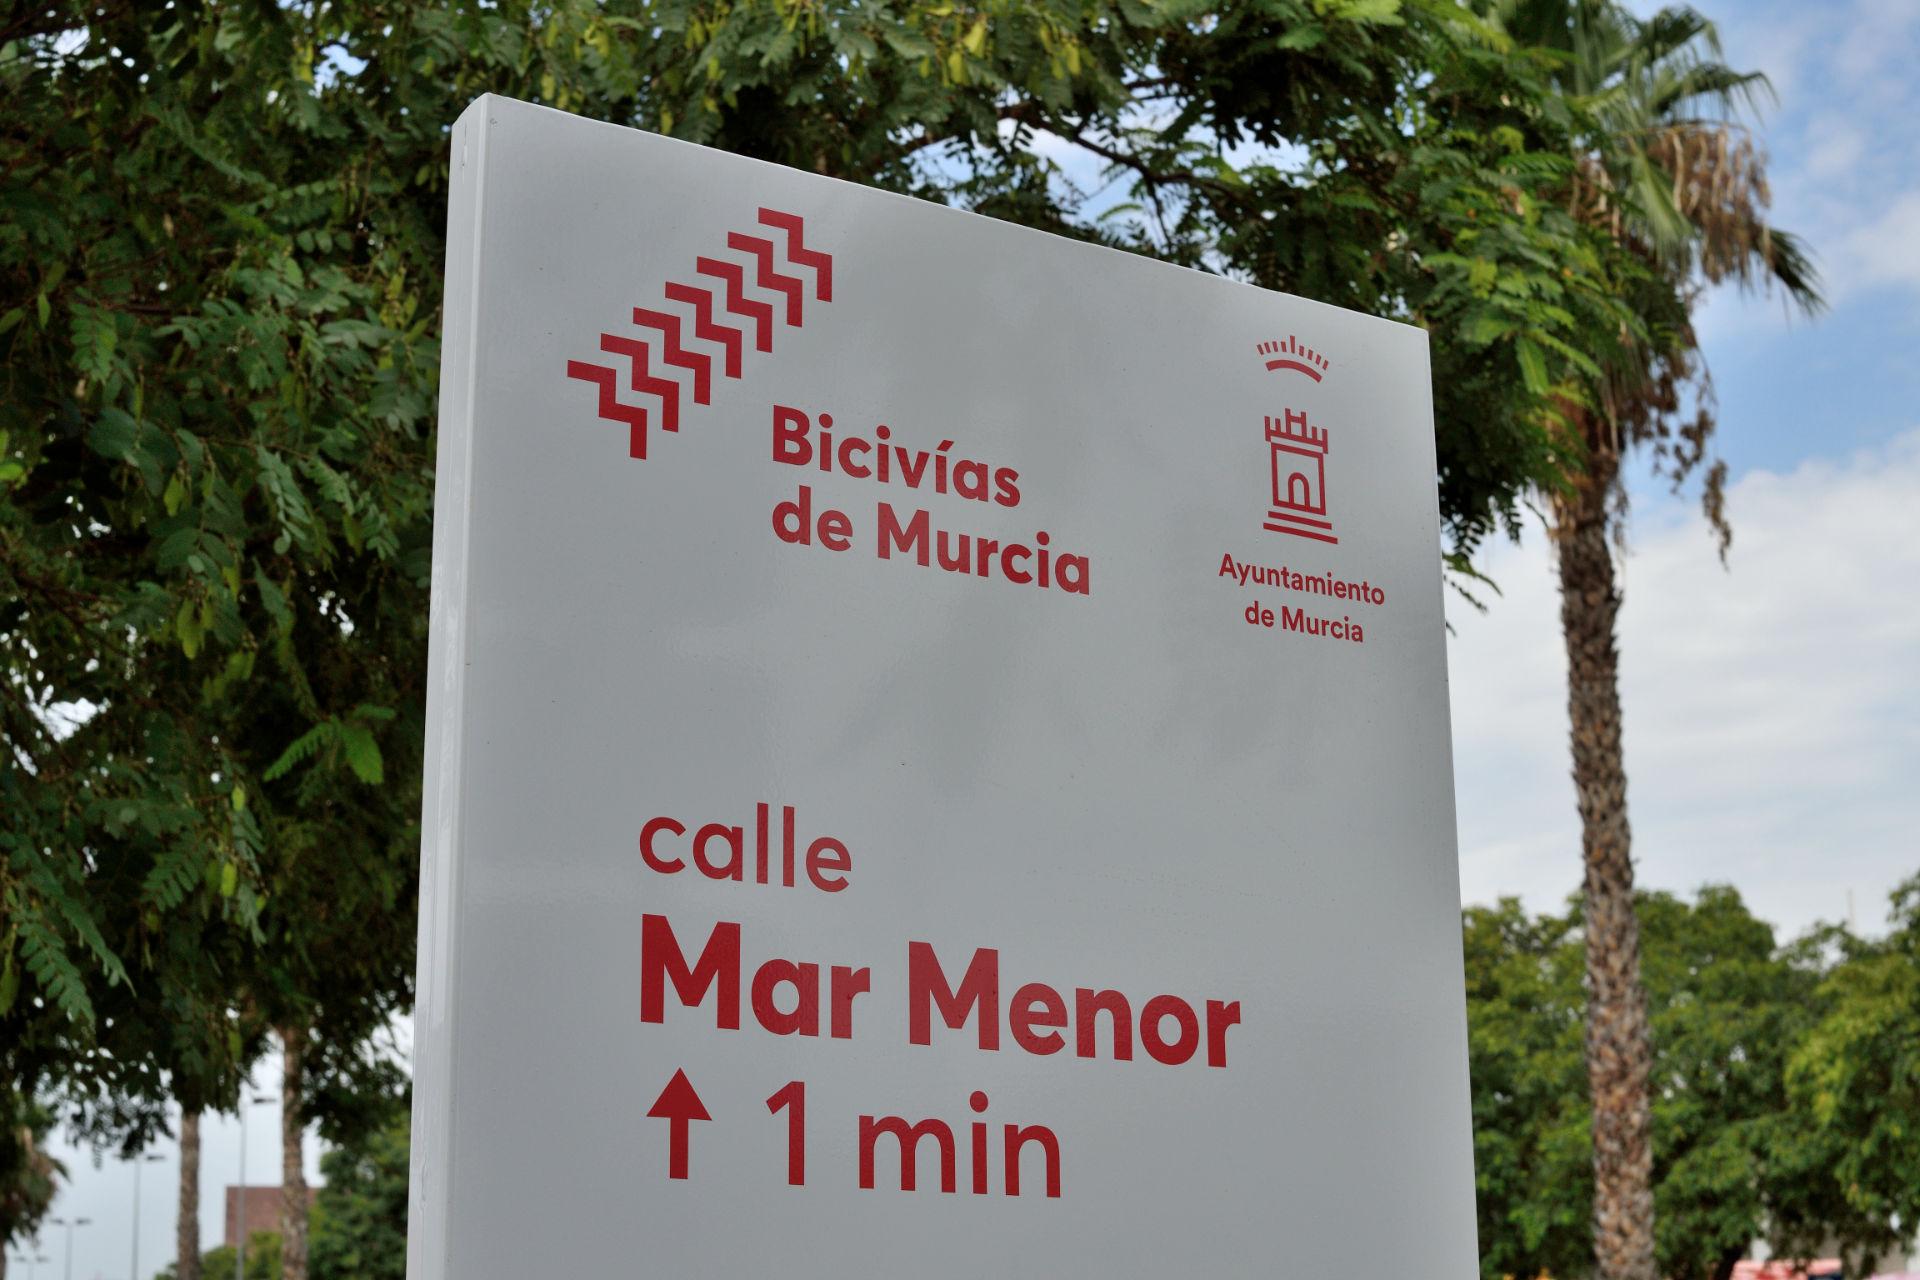 Señalética Bicivías de Murcia